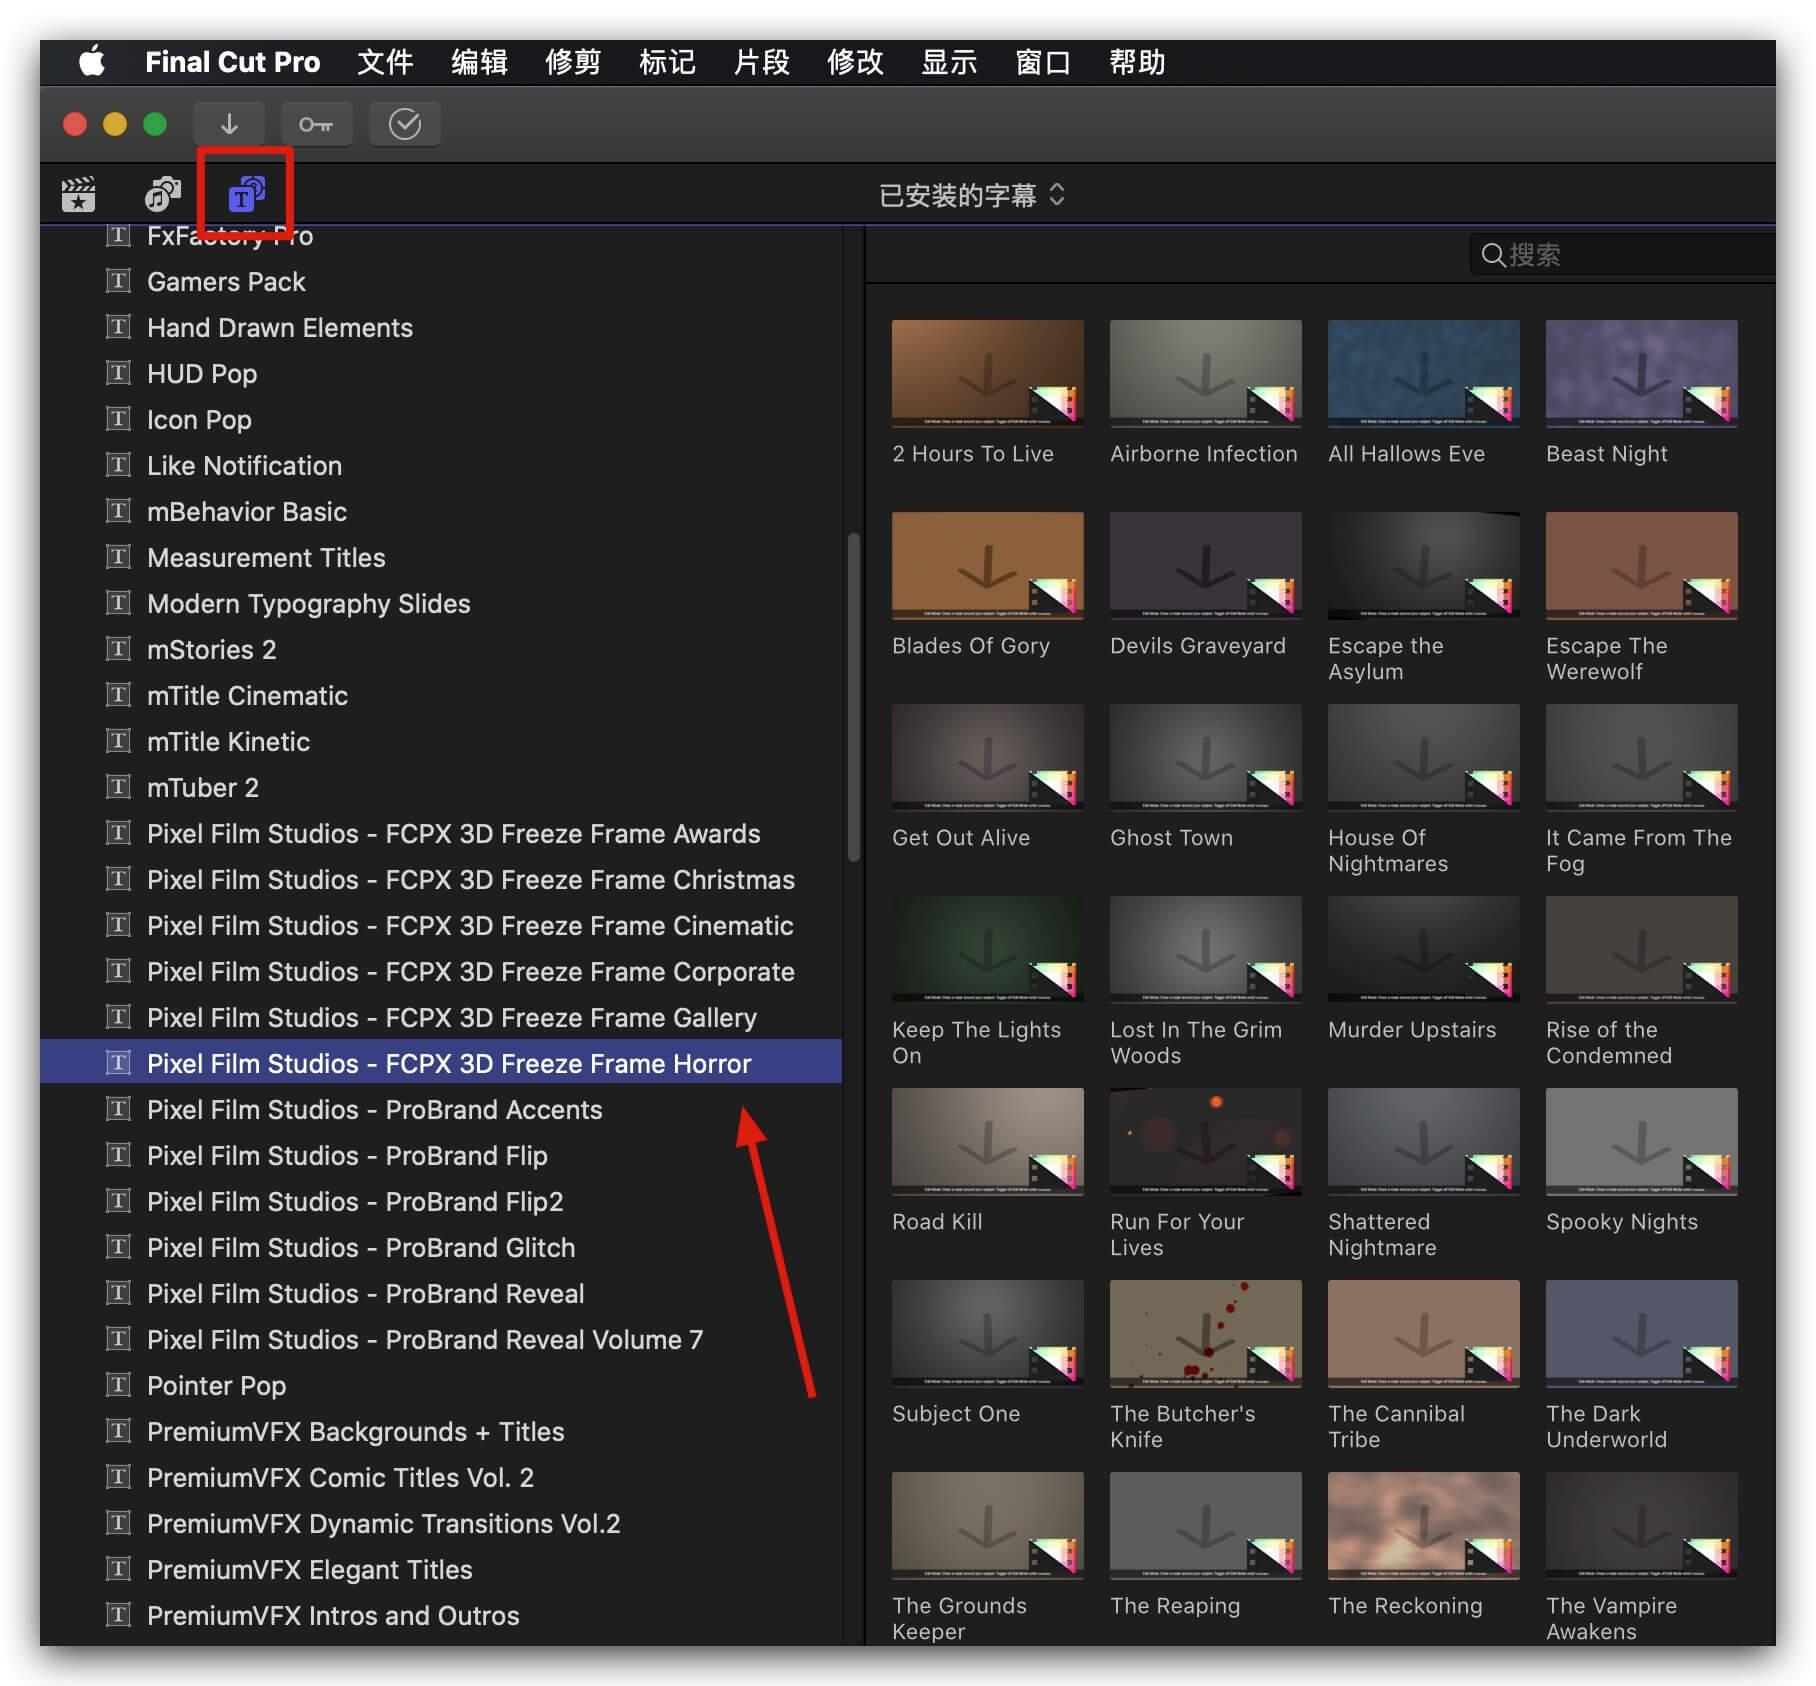 fcpx插件 30组恐怖风格定格冻结帧效果制作预设 3D Freeze Frame Horror